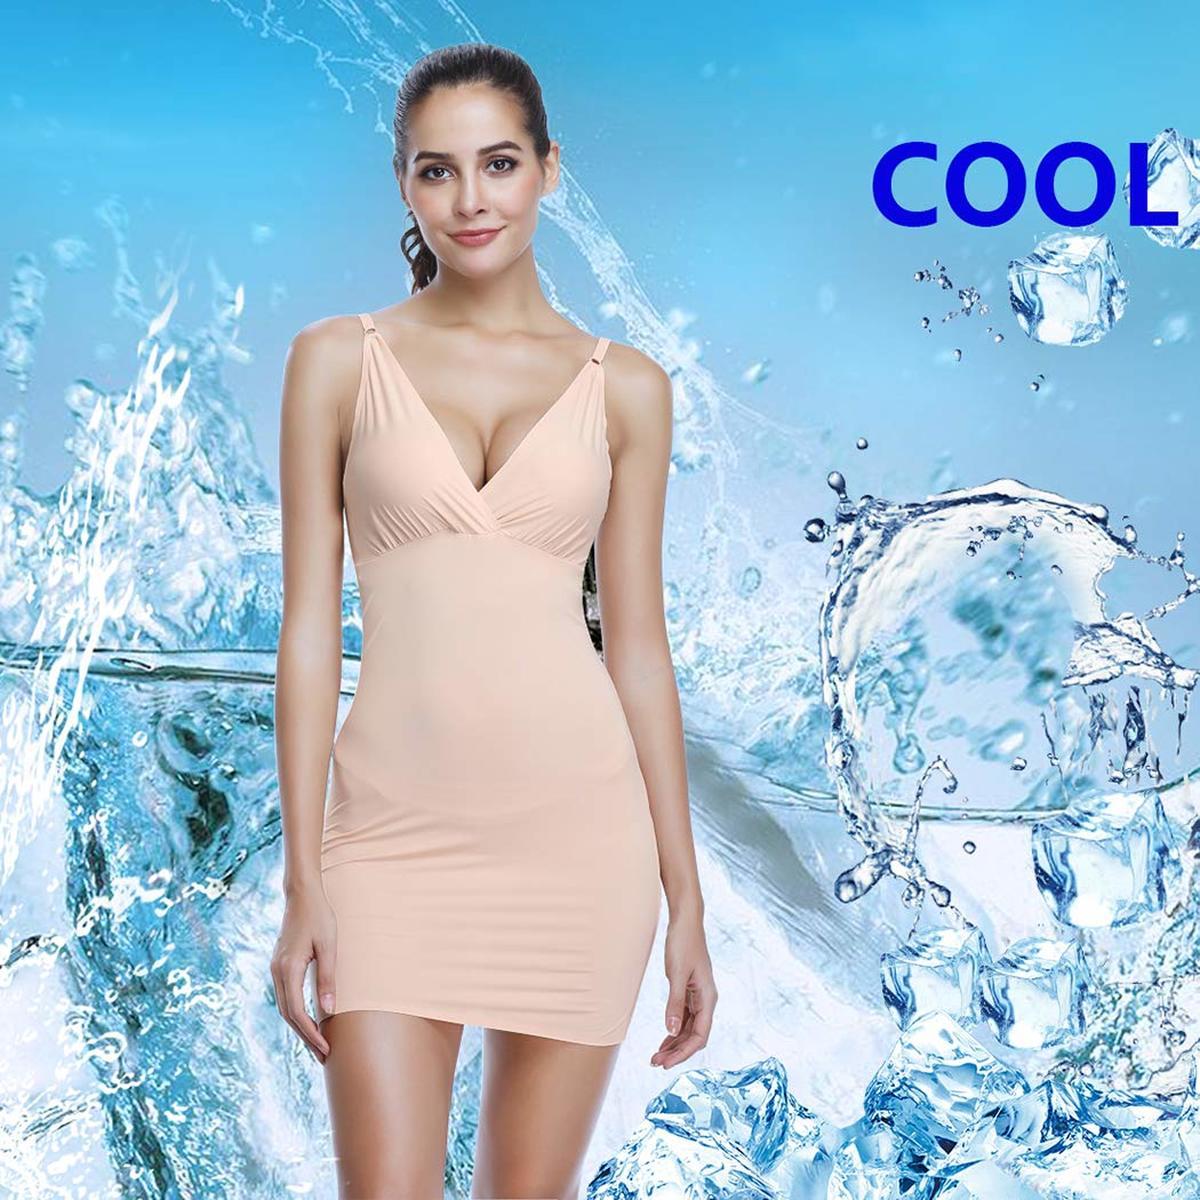 Full Slips for Women Under Dresses Shaping Adjustable Control Slip Body Shaper Chest Pull Up Shapewear Seamless V Neck Sleepwear